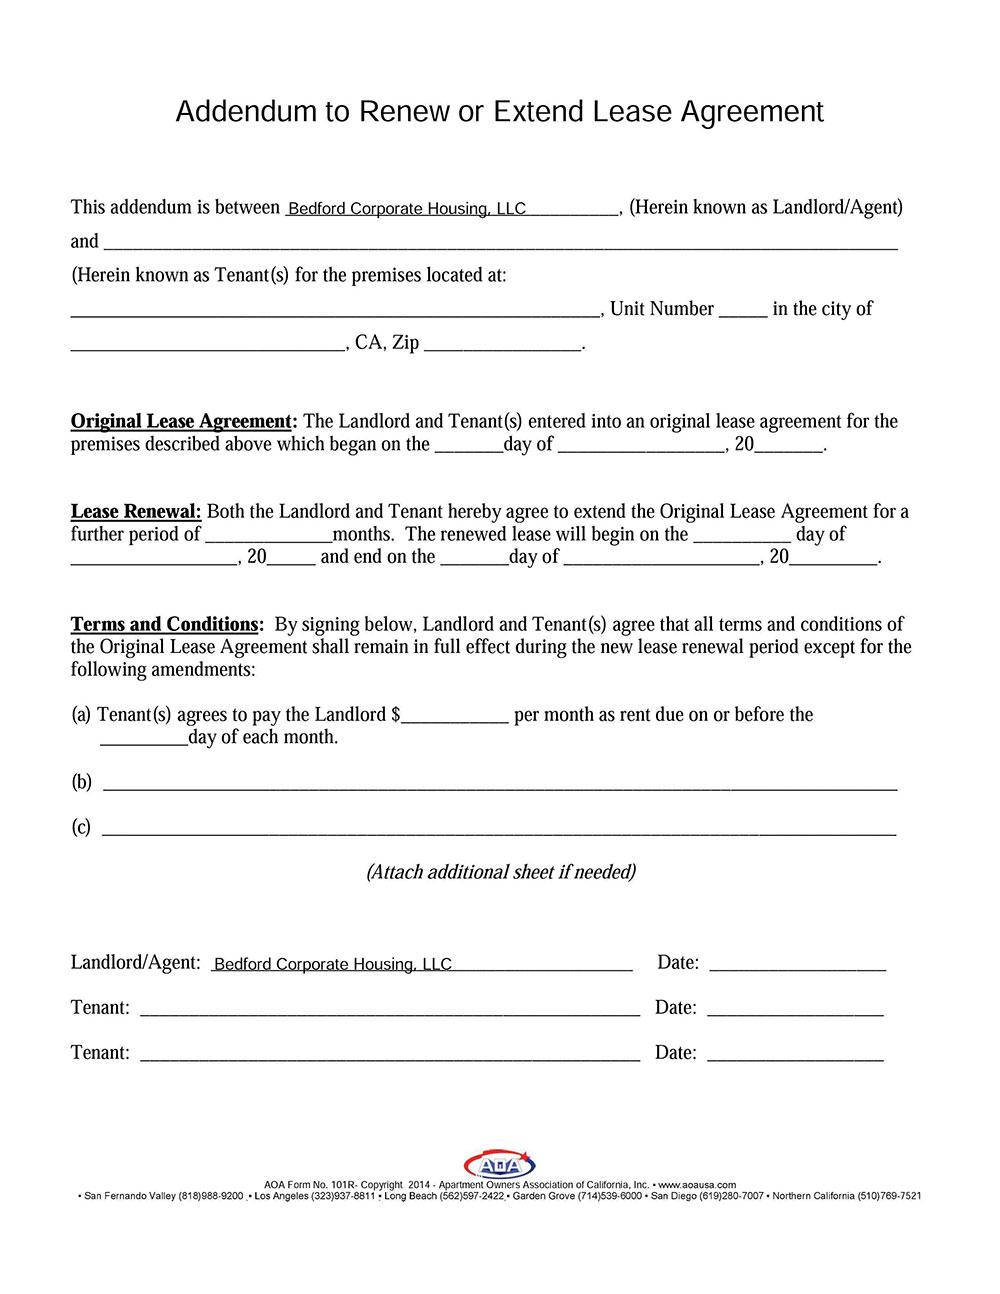 Online Samples Rental Agreements 650*841 - Pet Addendum To Rental - Free Printable Pet Addendum